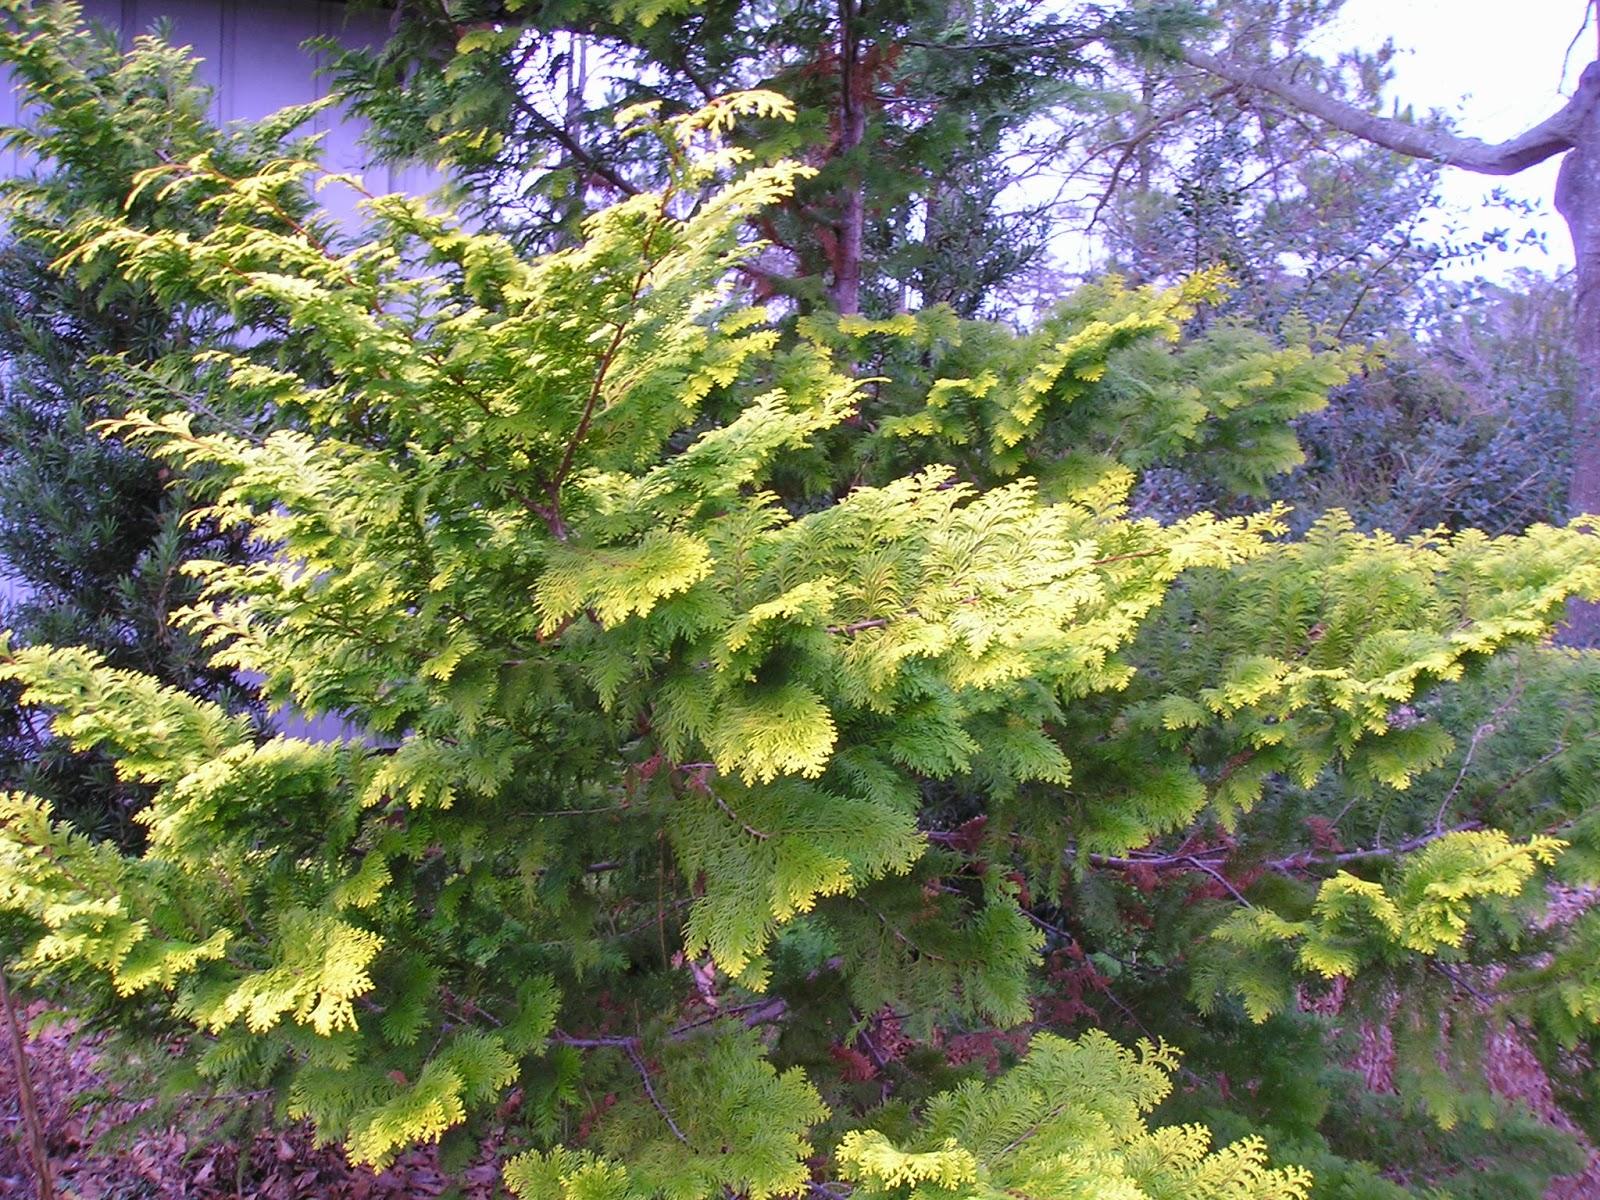 Carol S Garden: Carol's Greenville NC Garden: Hinoki Cypress 'Crippsii